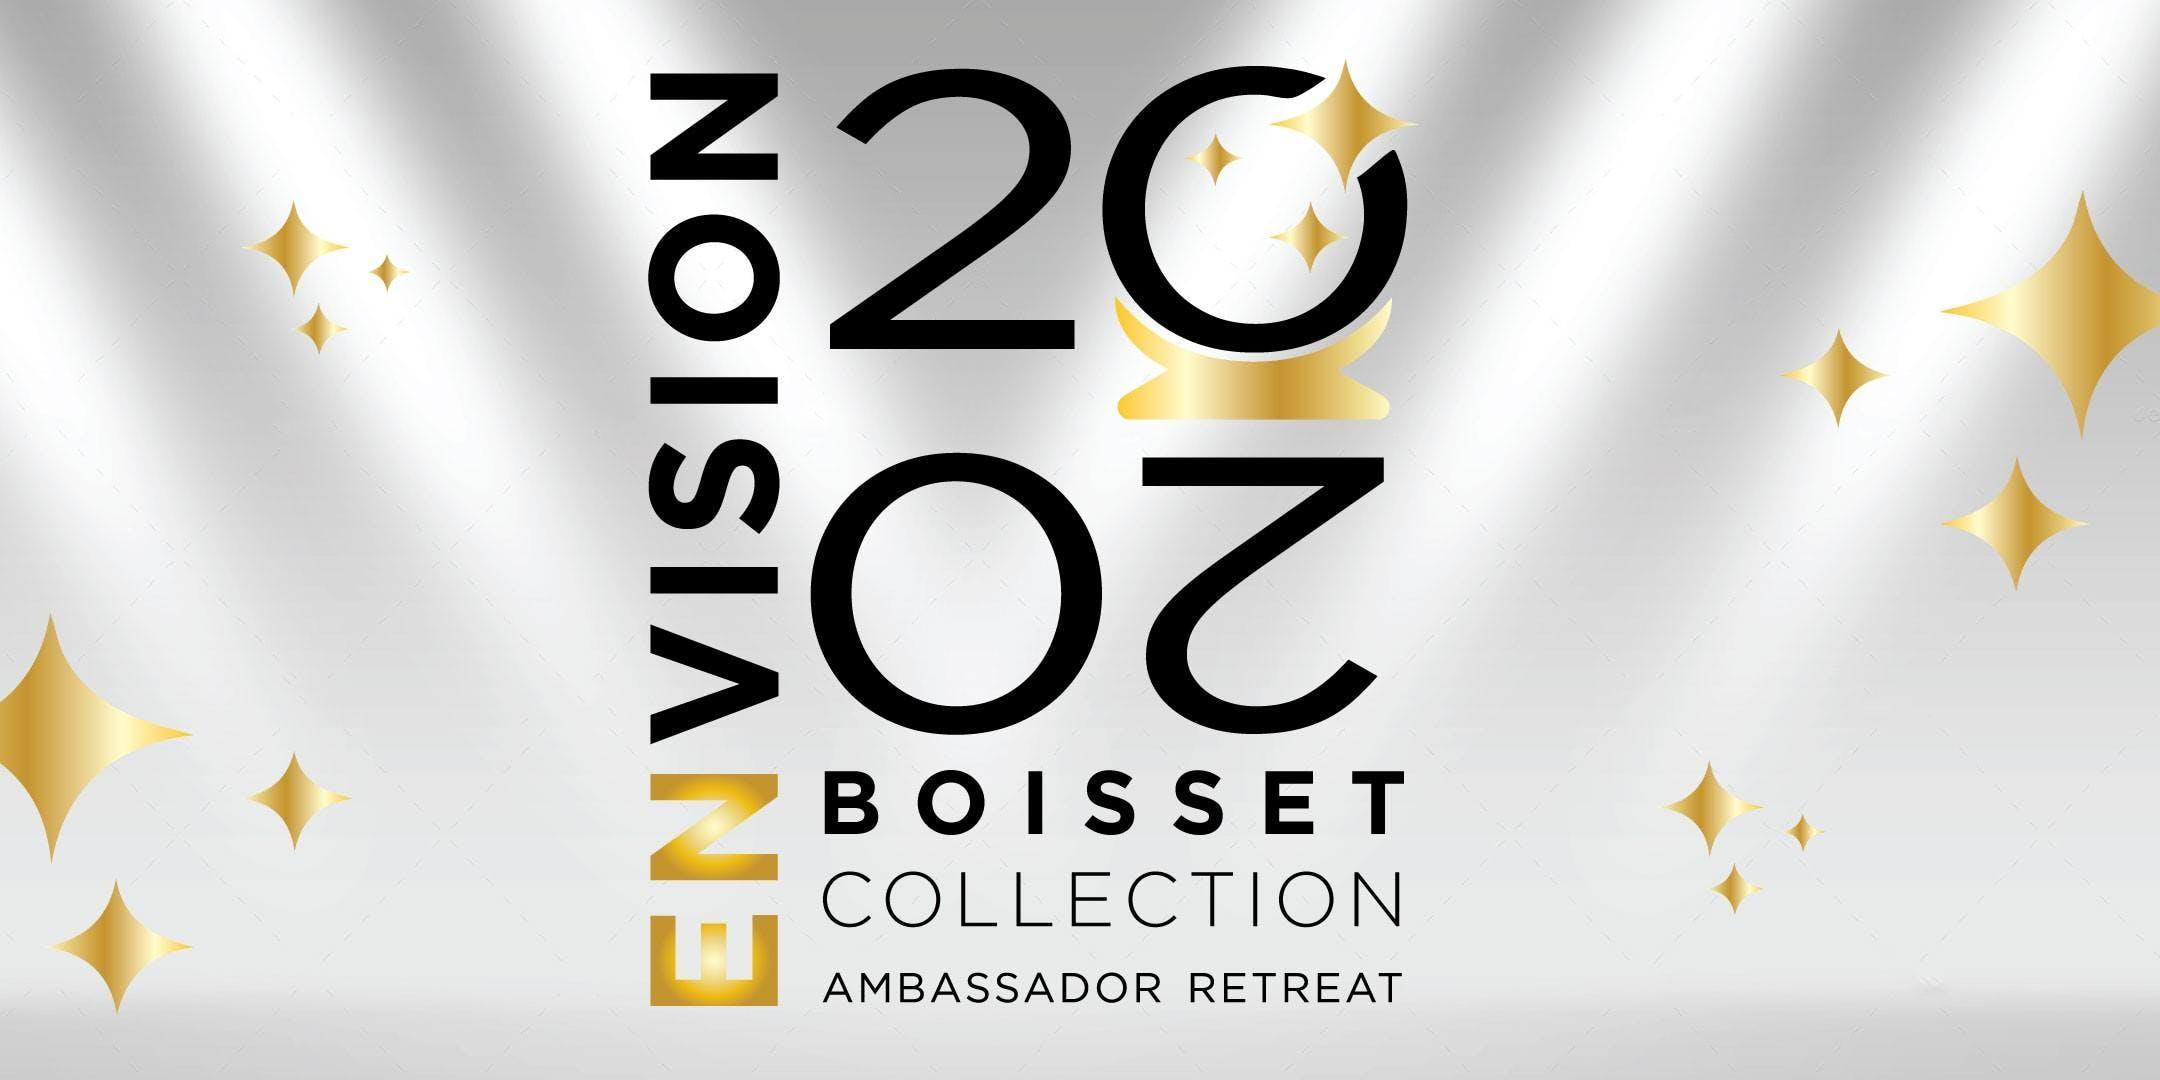 Boisset Ambassador Retreat - ENVISION 2020